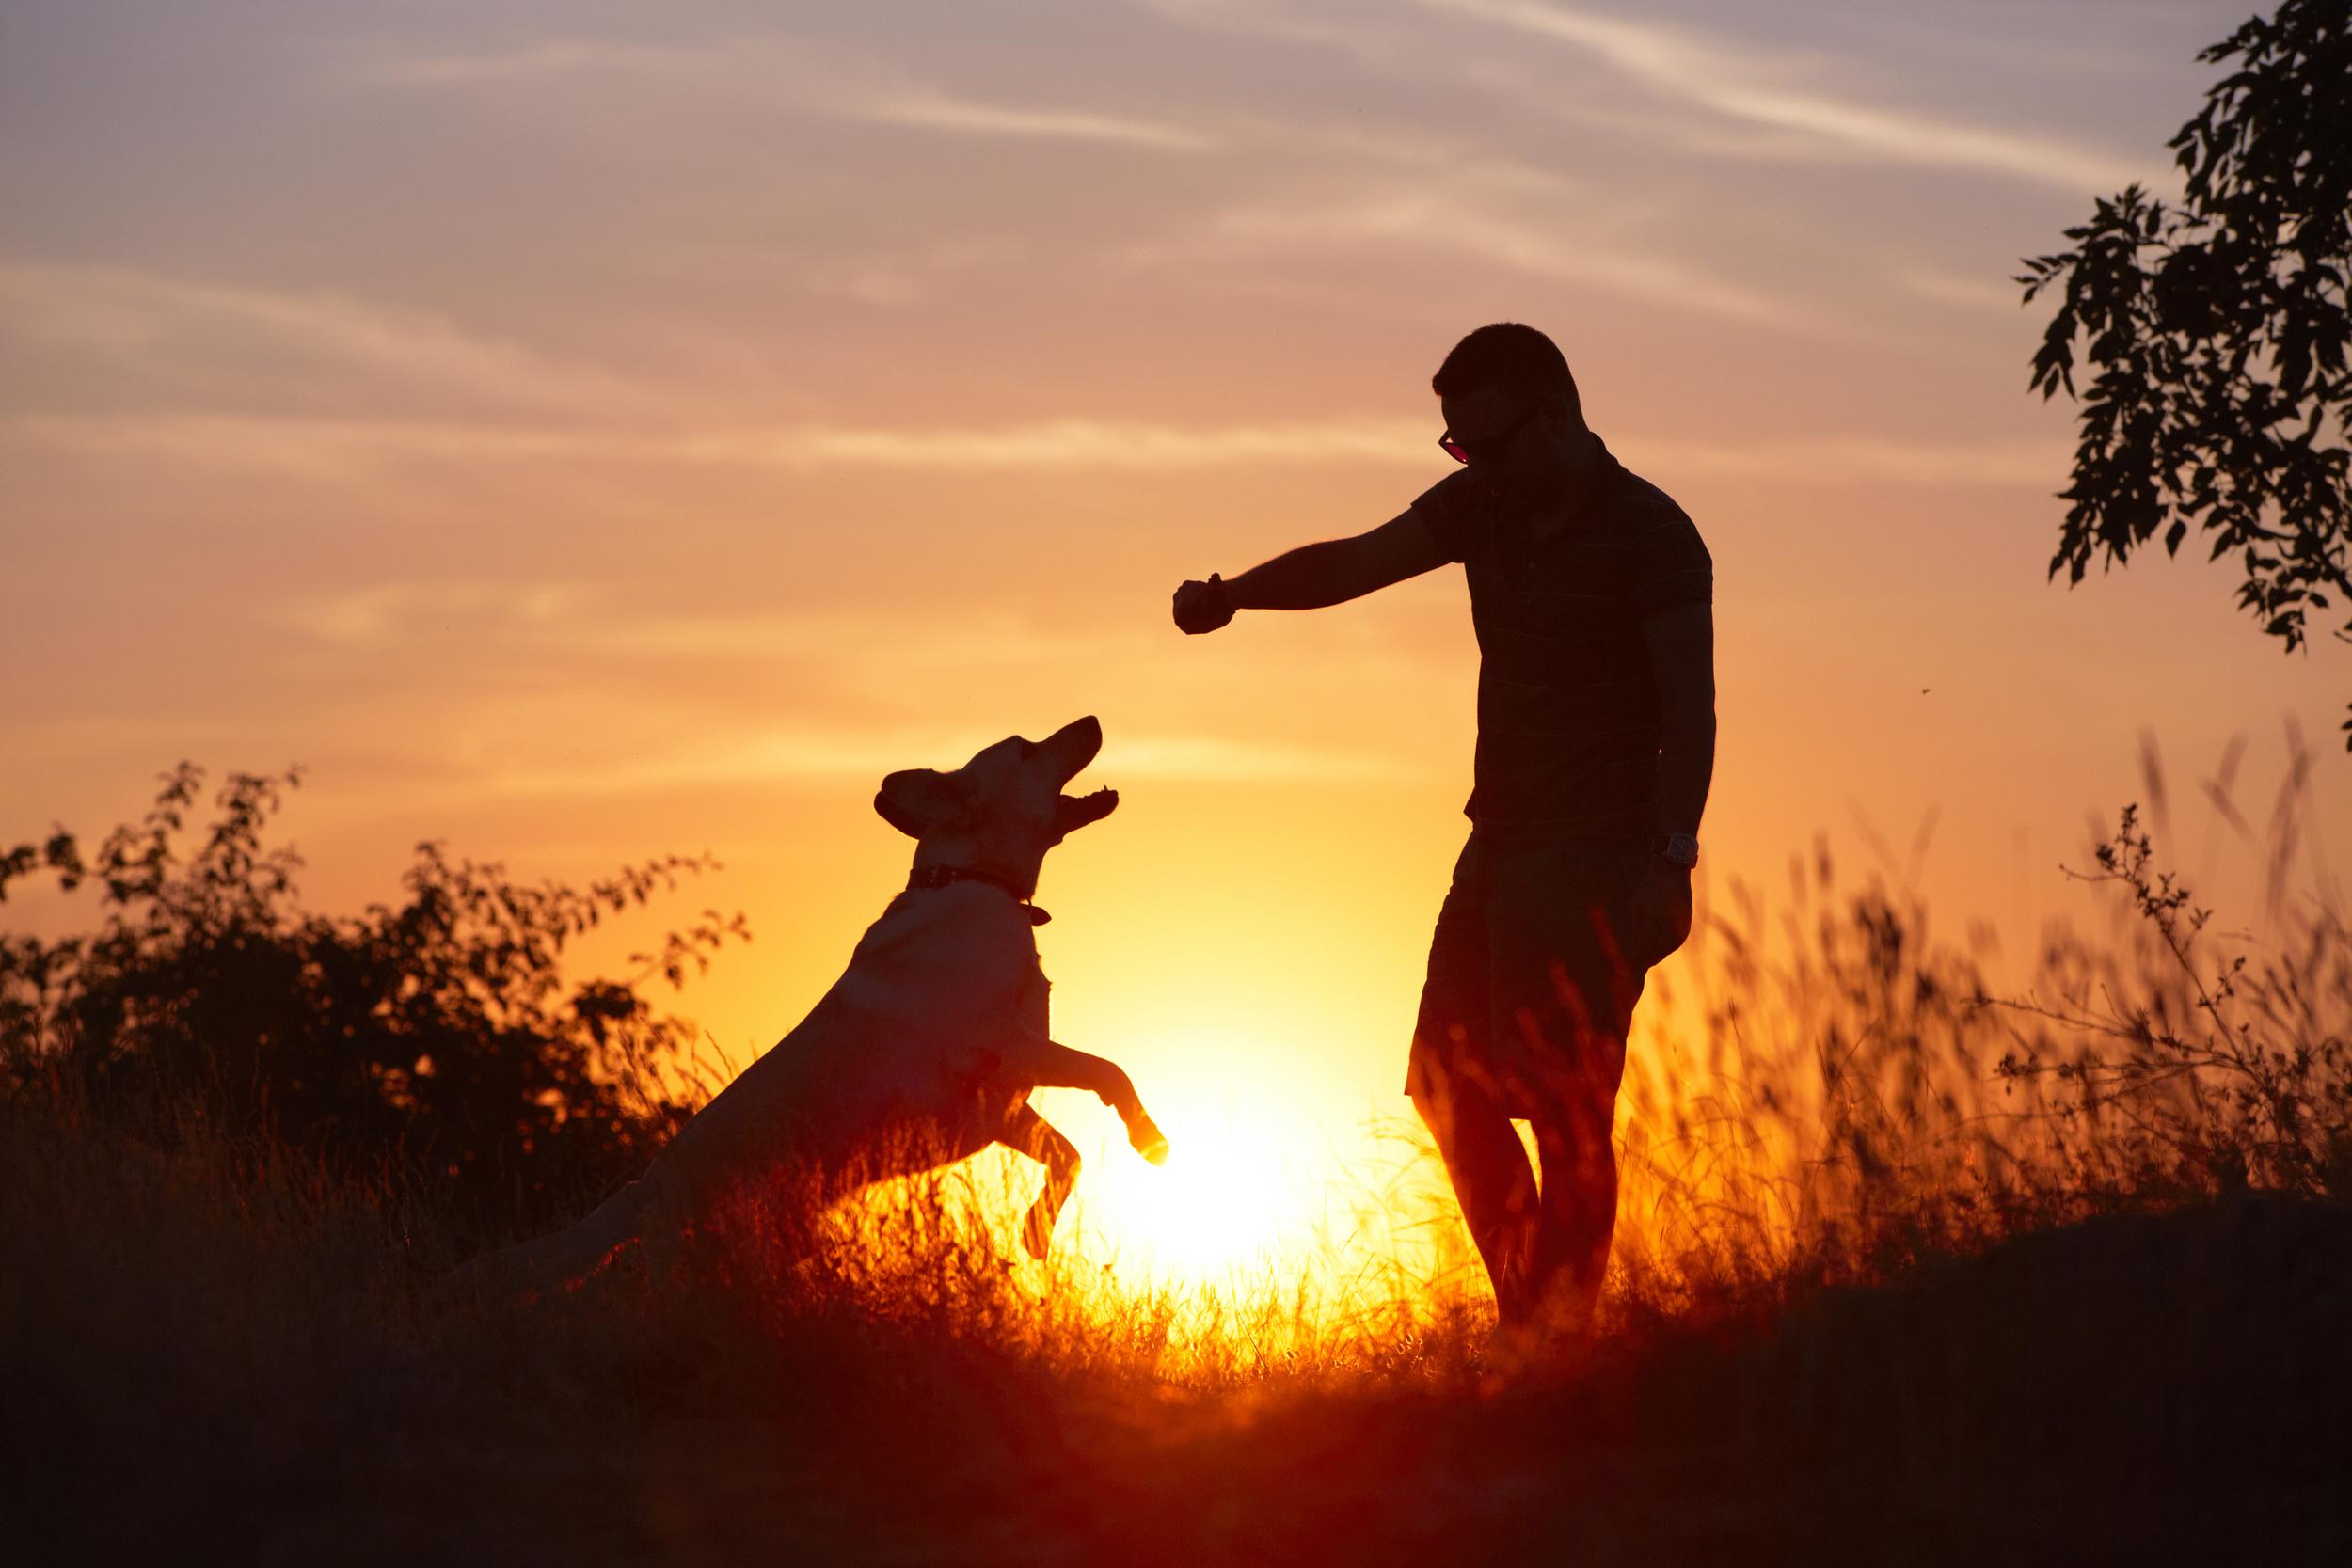 bigstock-Man-With-Dog-48271799.jpg